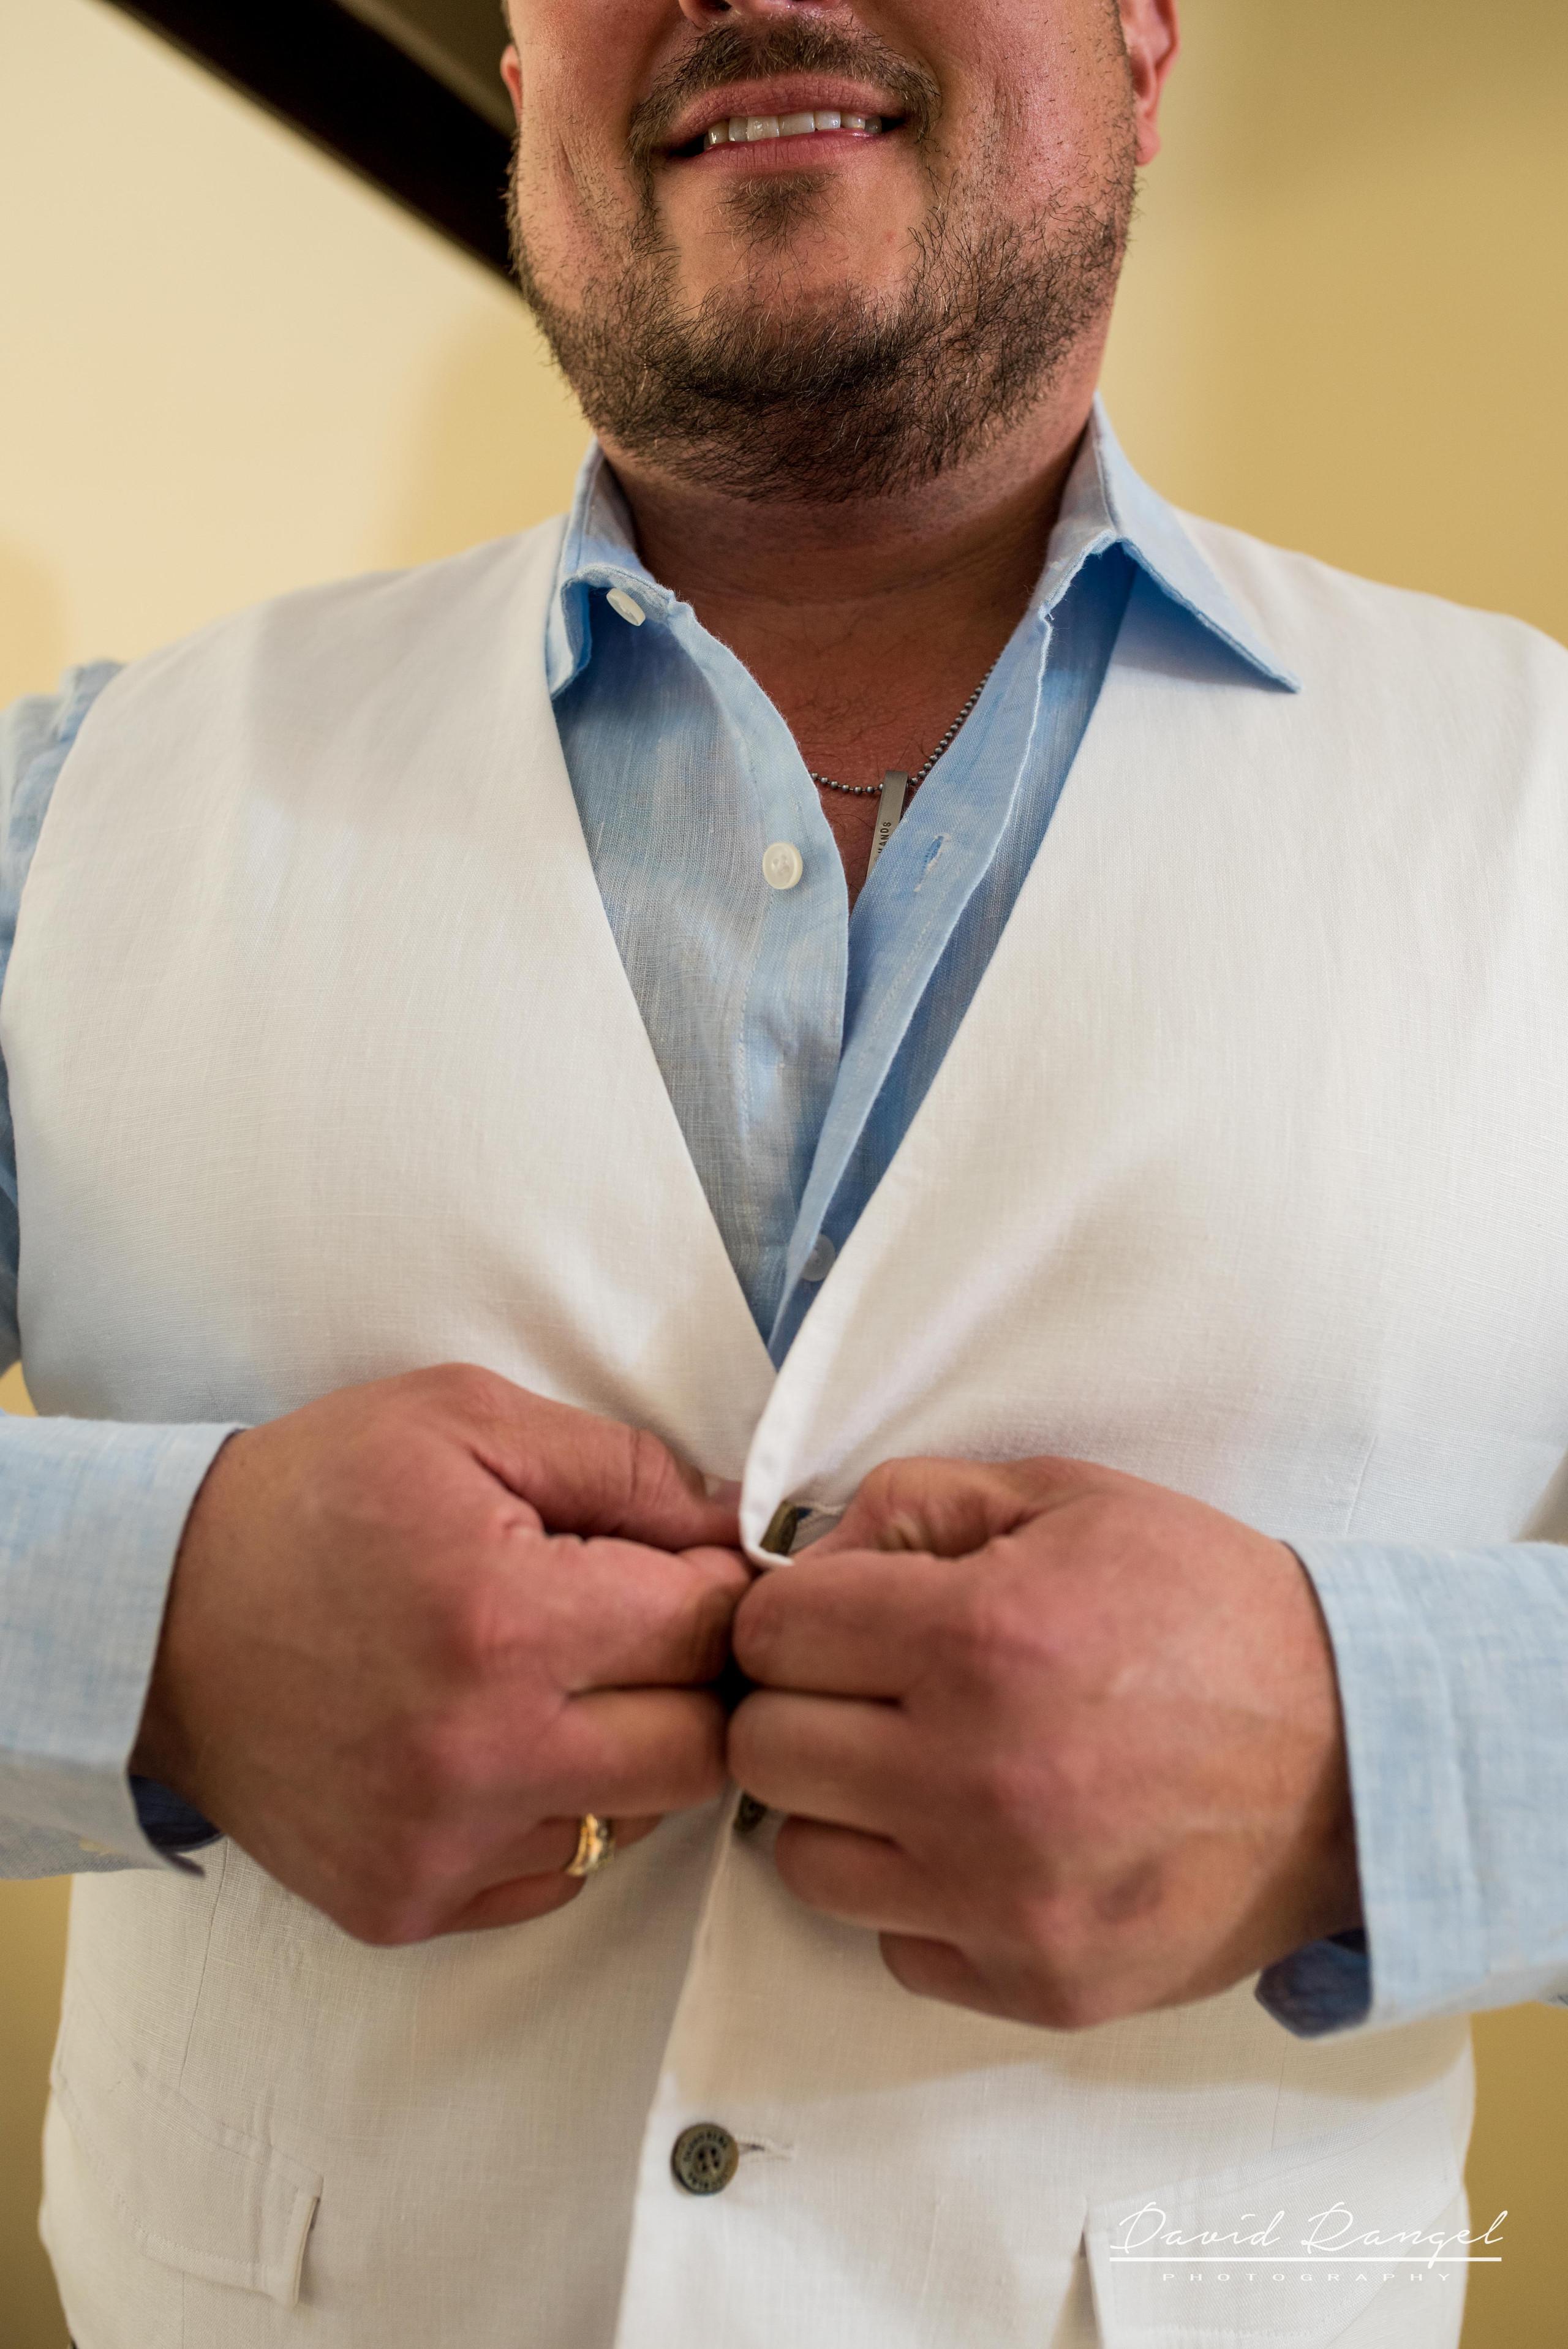 Groom+vest+botton+shirt+hands+photo